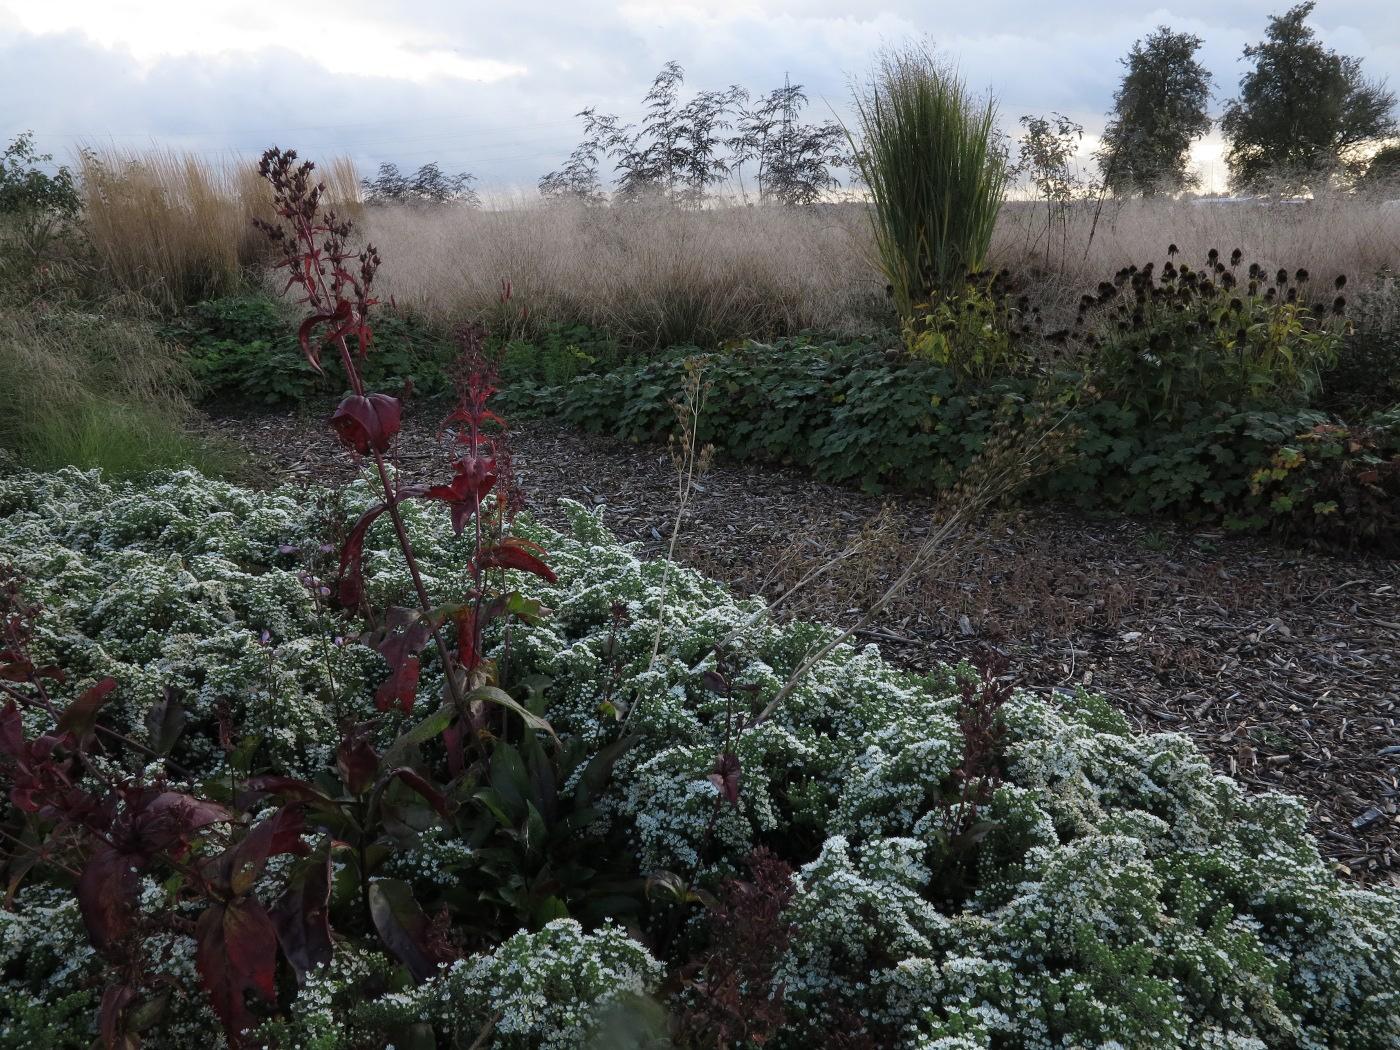 Aster ericoides var. prostratus 'Snow Flurry'